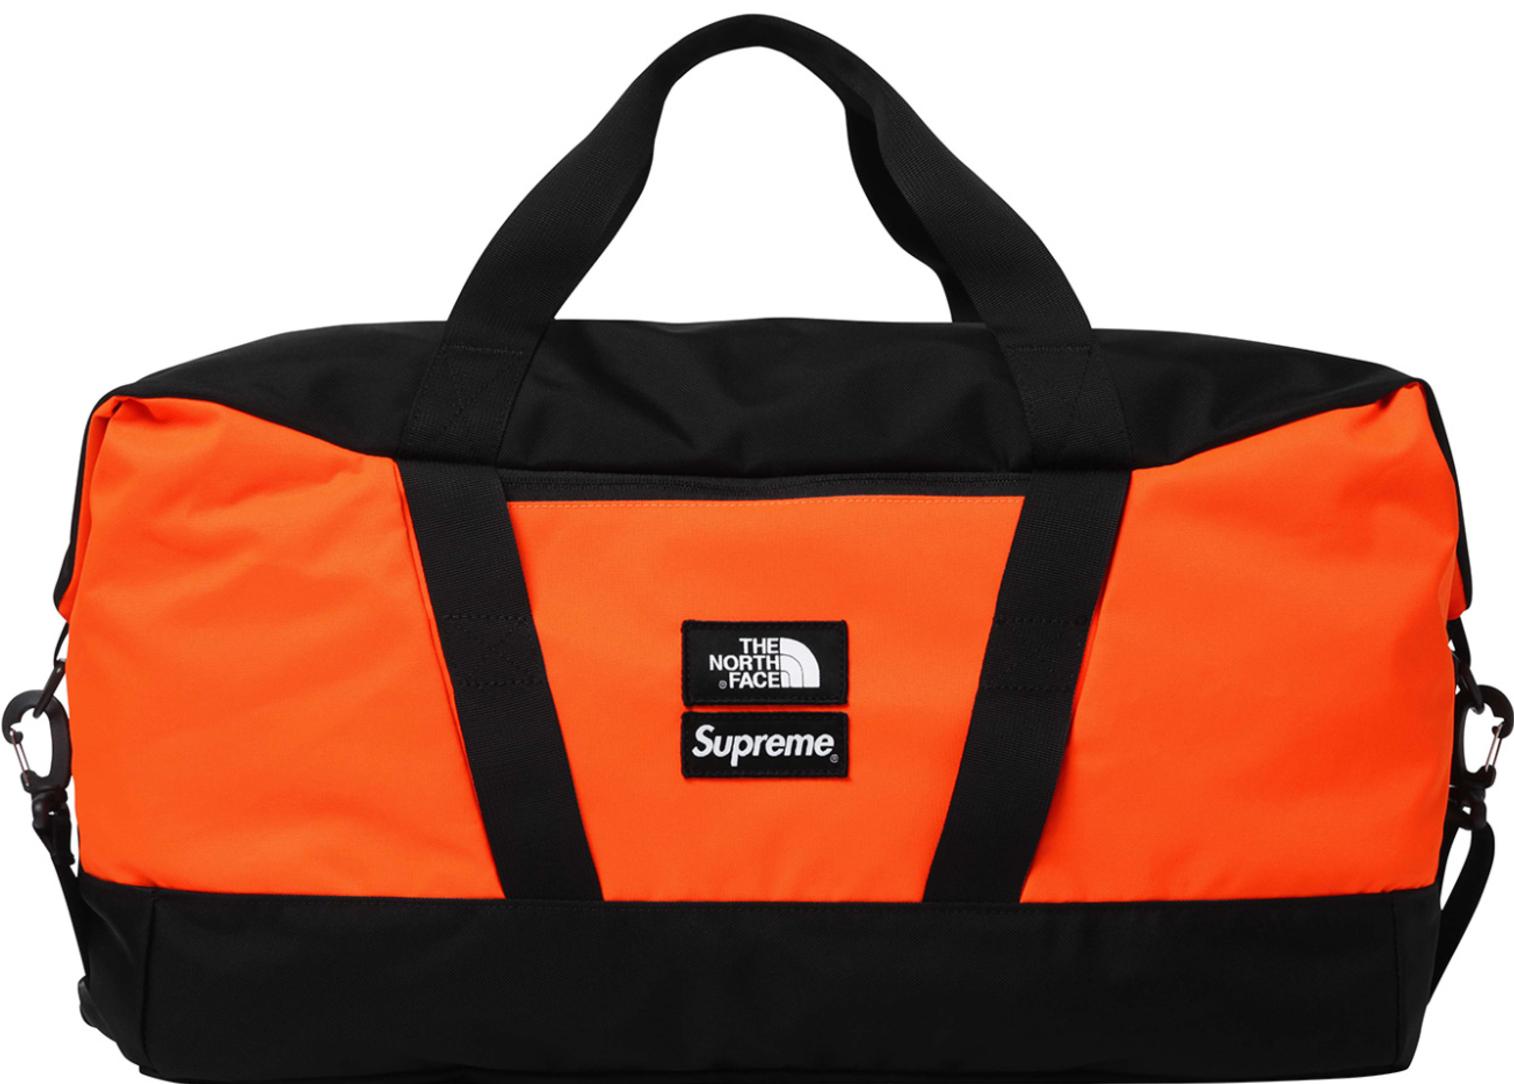 Supreme x The North Face Apex Duffel Bag, $128